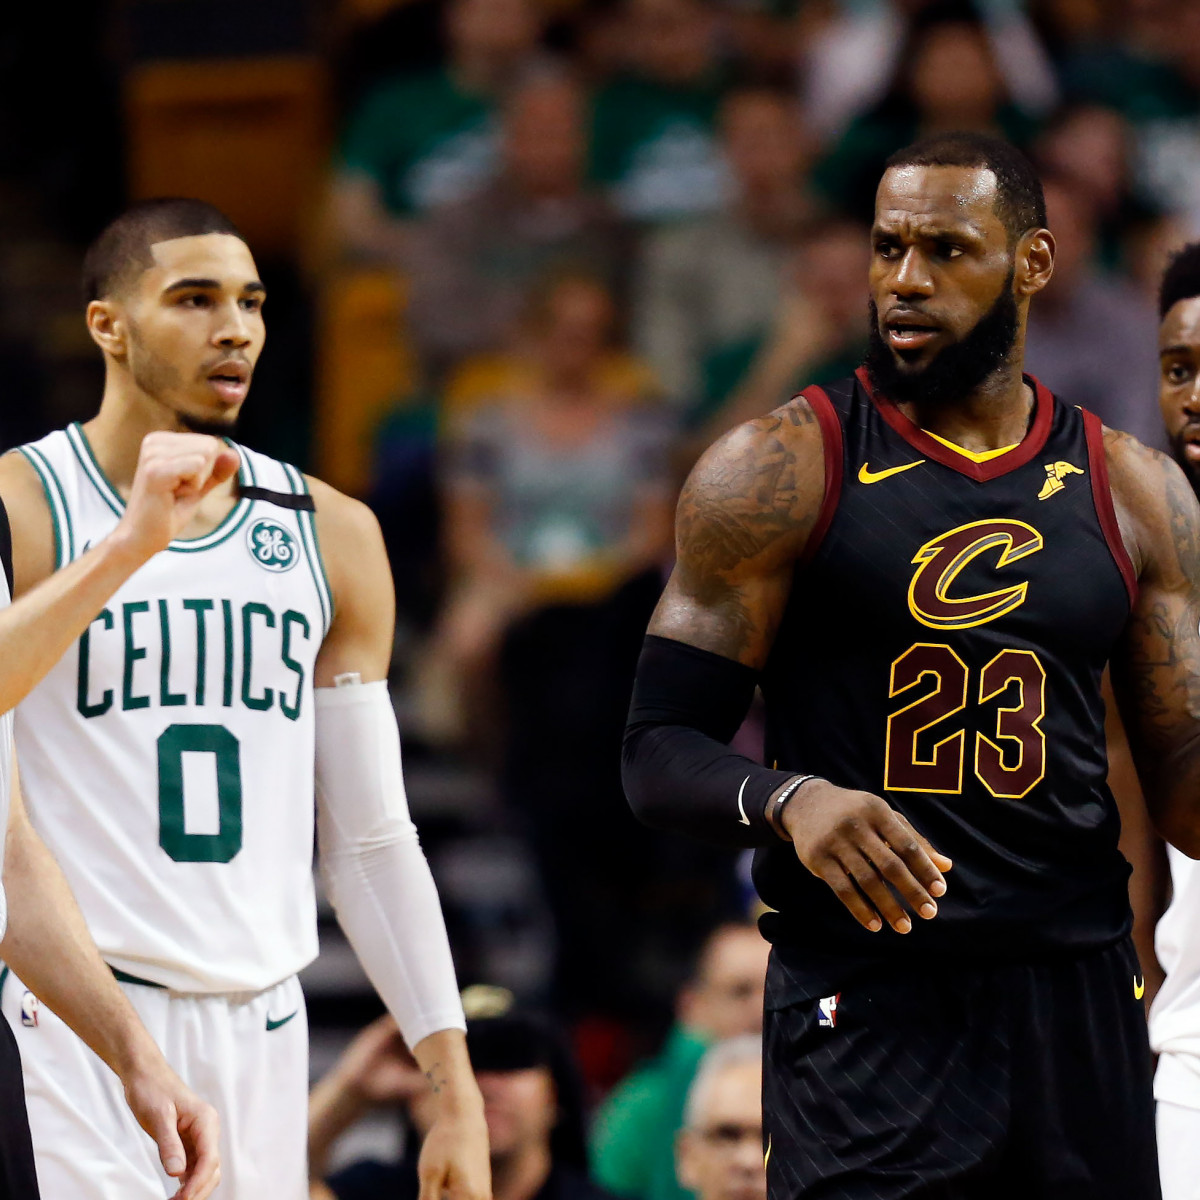 Cleveland Cavaliers Vs. Boston Celtics: Game 7 Live